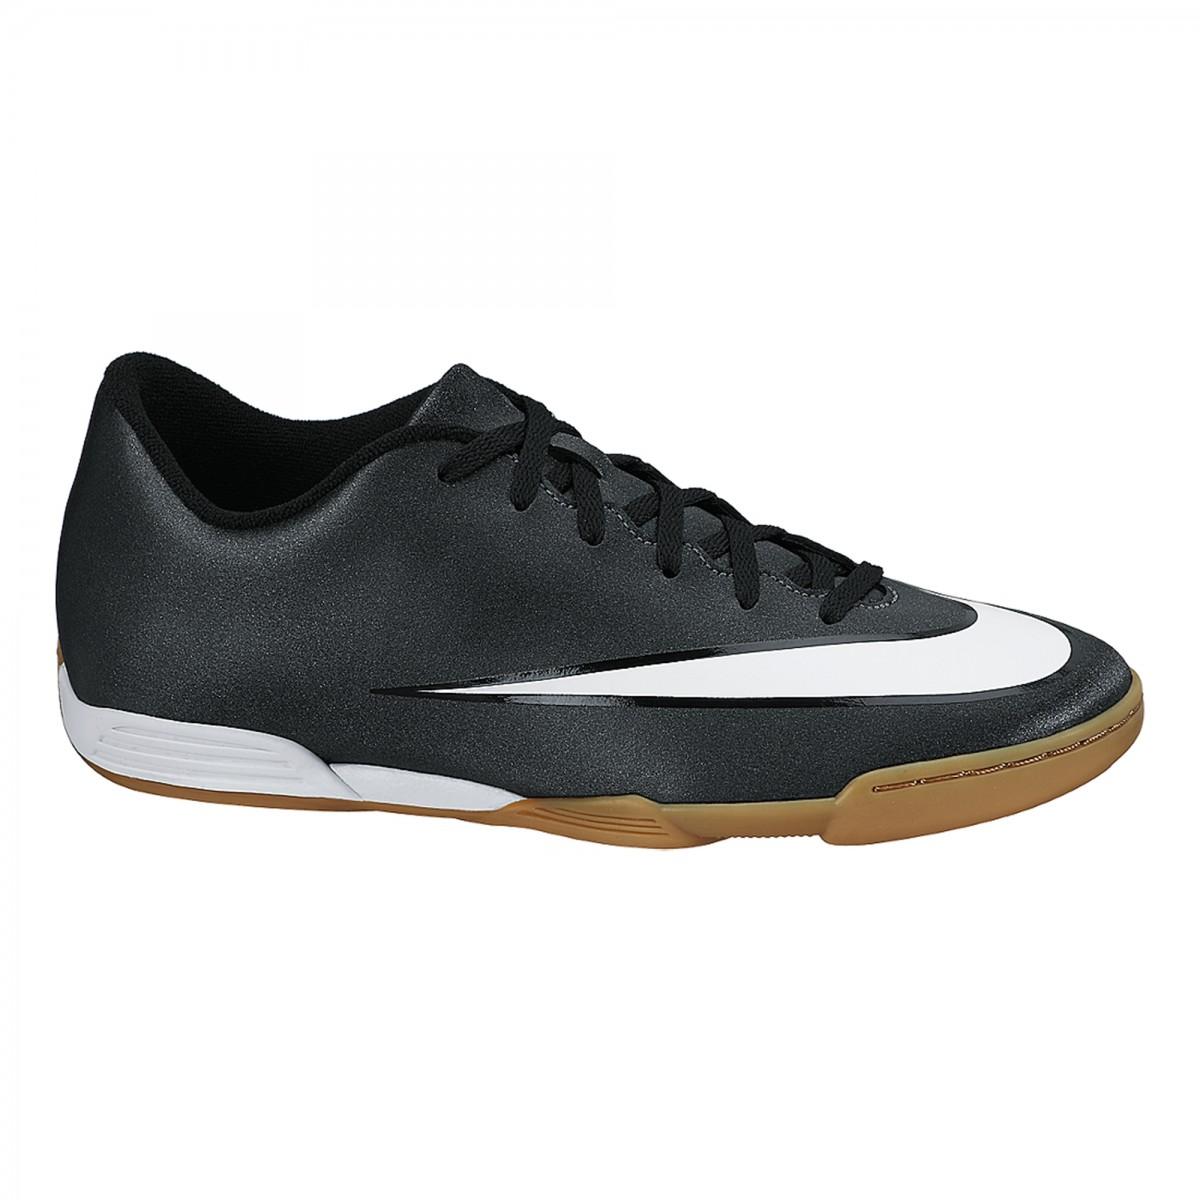 7bdcef9ad7 Bizz Store - Chuteira Futsal Nike Mercurial Vortex II Cristiano Ronaldo